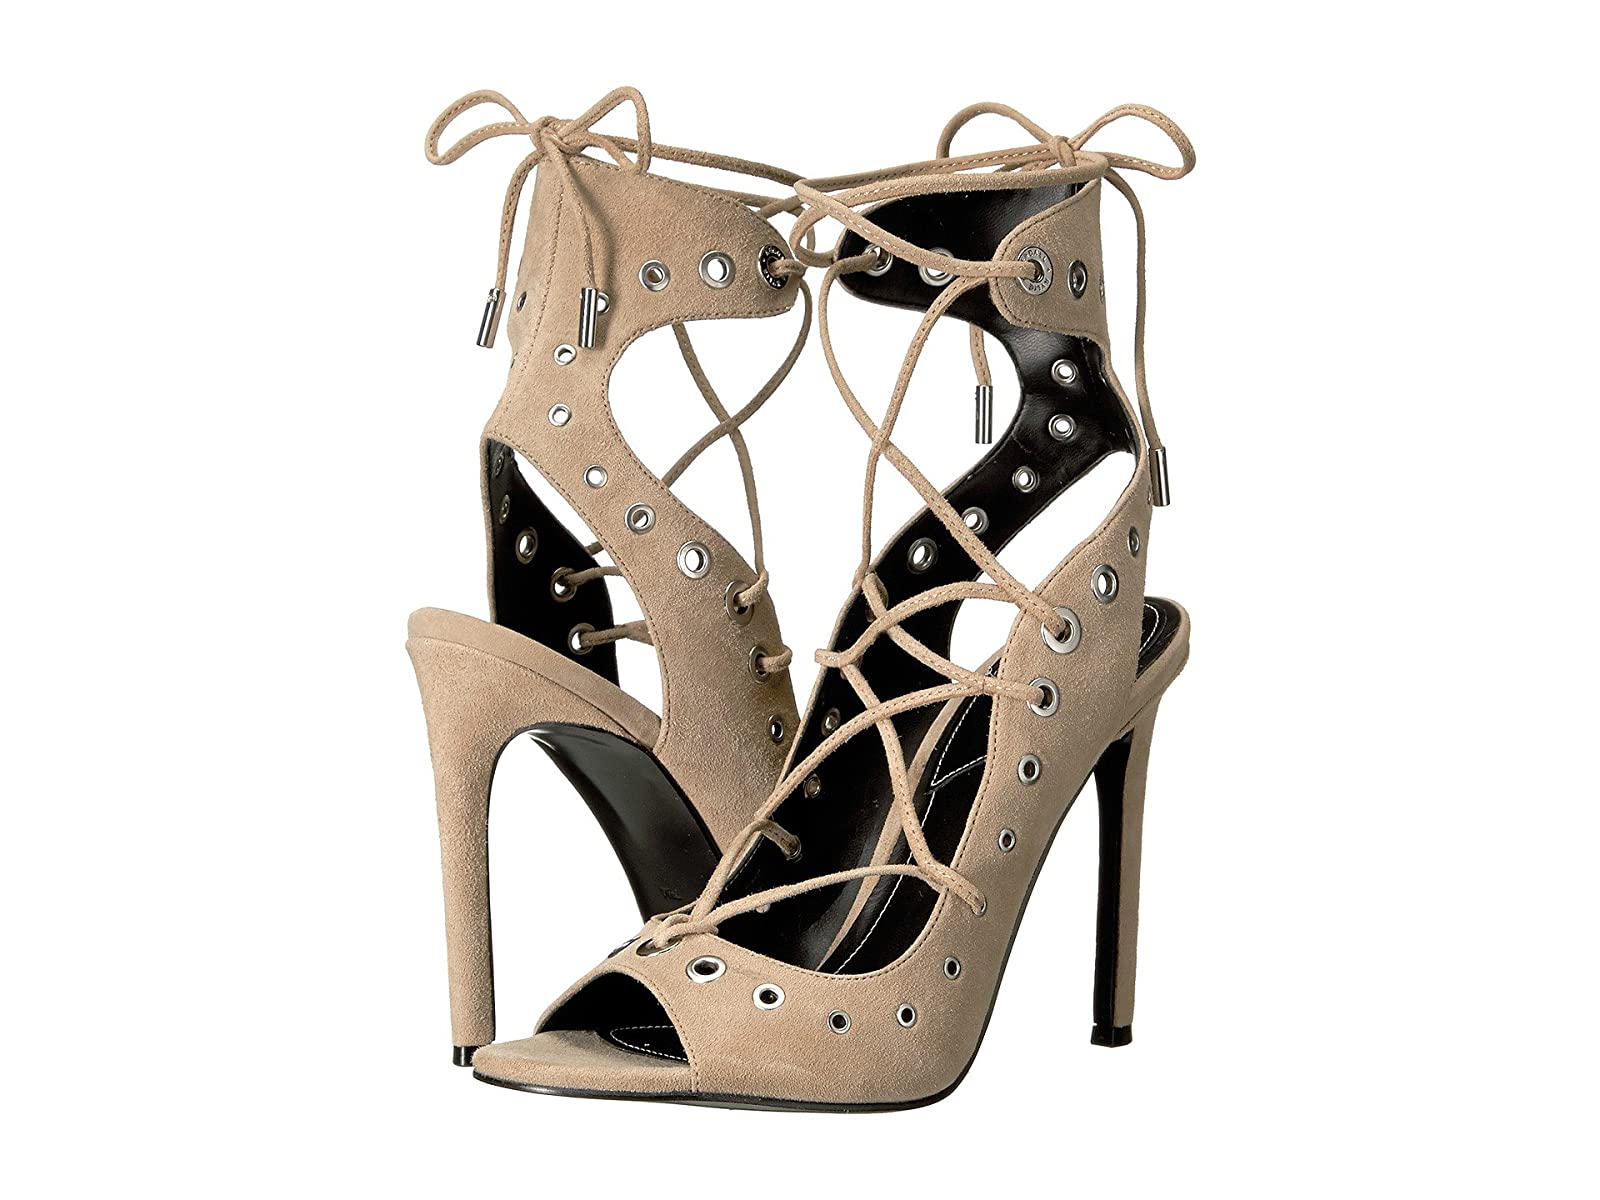 KENDALL + KYLIE DeannaCheap and distinctive eye-catching shoes